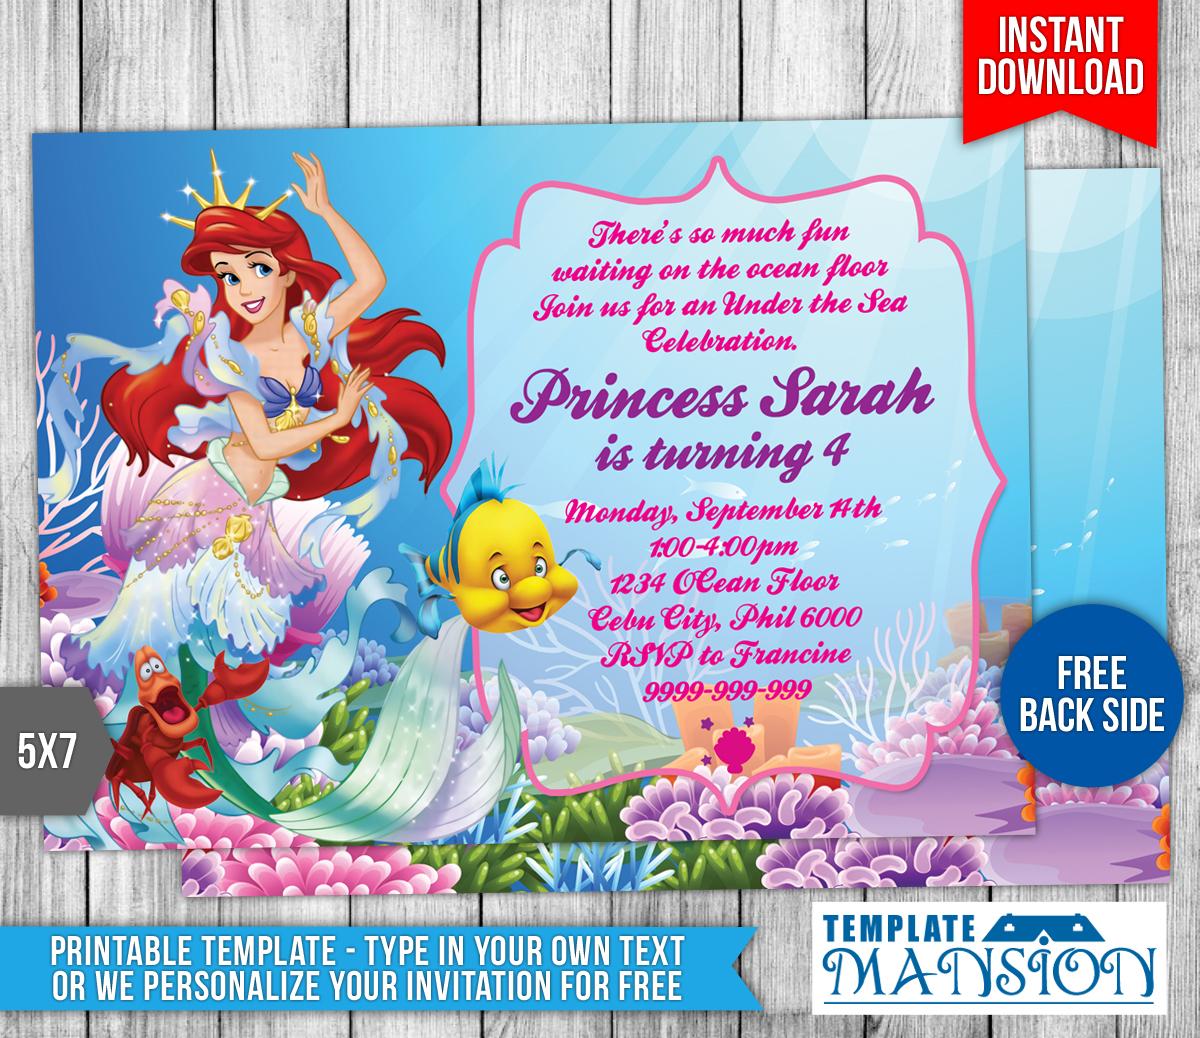 Little Mermaid Birthday Invitation #2 by templatemansion on DeviantArt